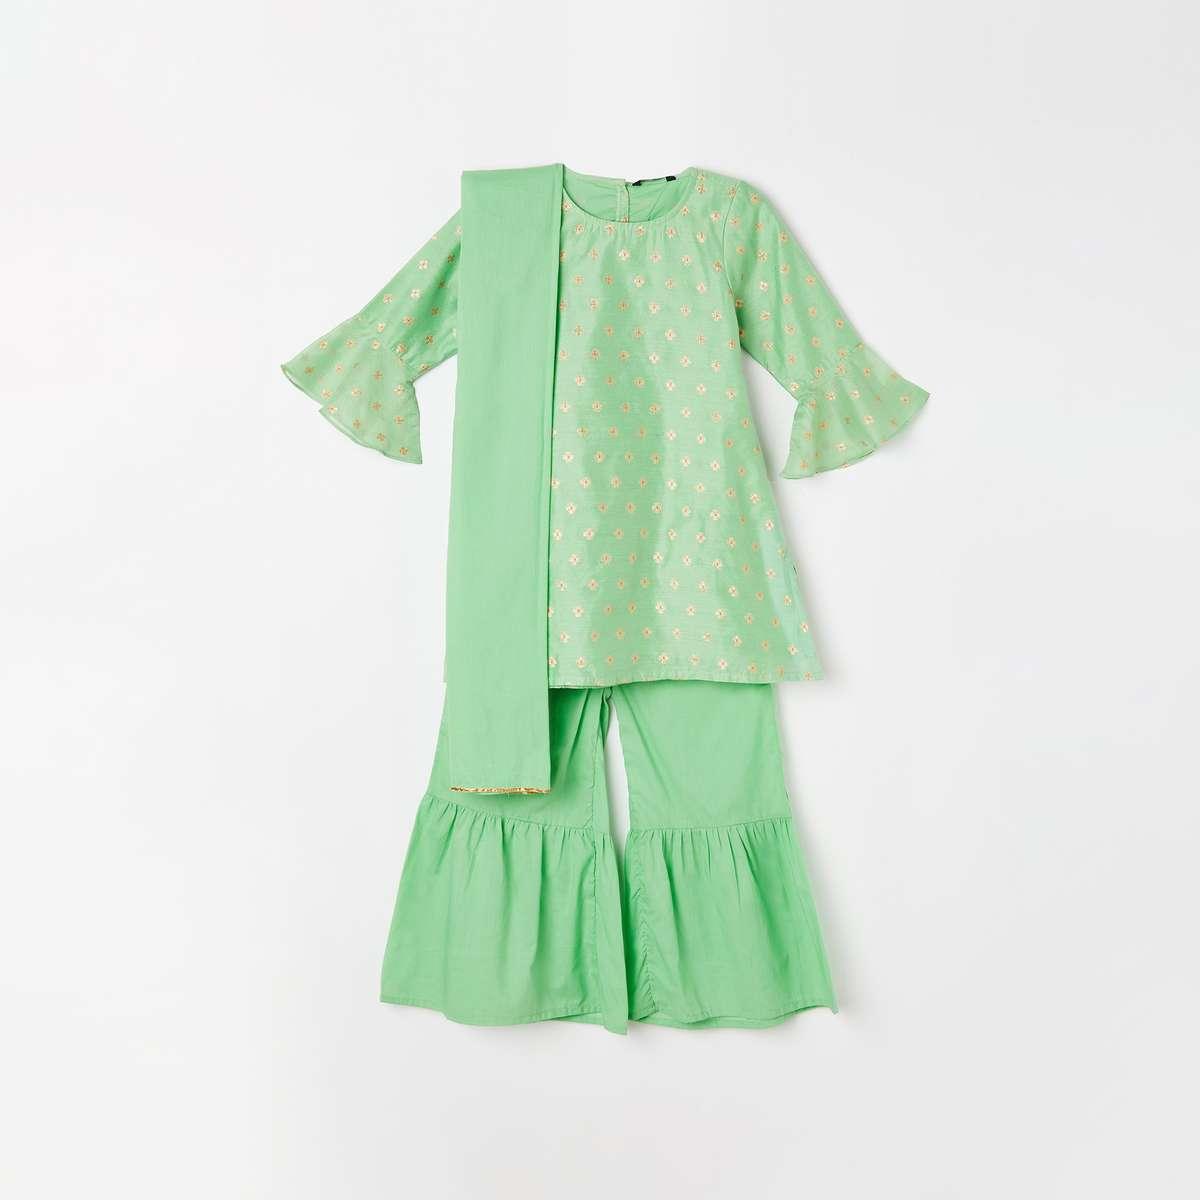 3.MELANGE Girls Embroidered Kurta with Solid Sharara Pants and Dupatta